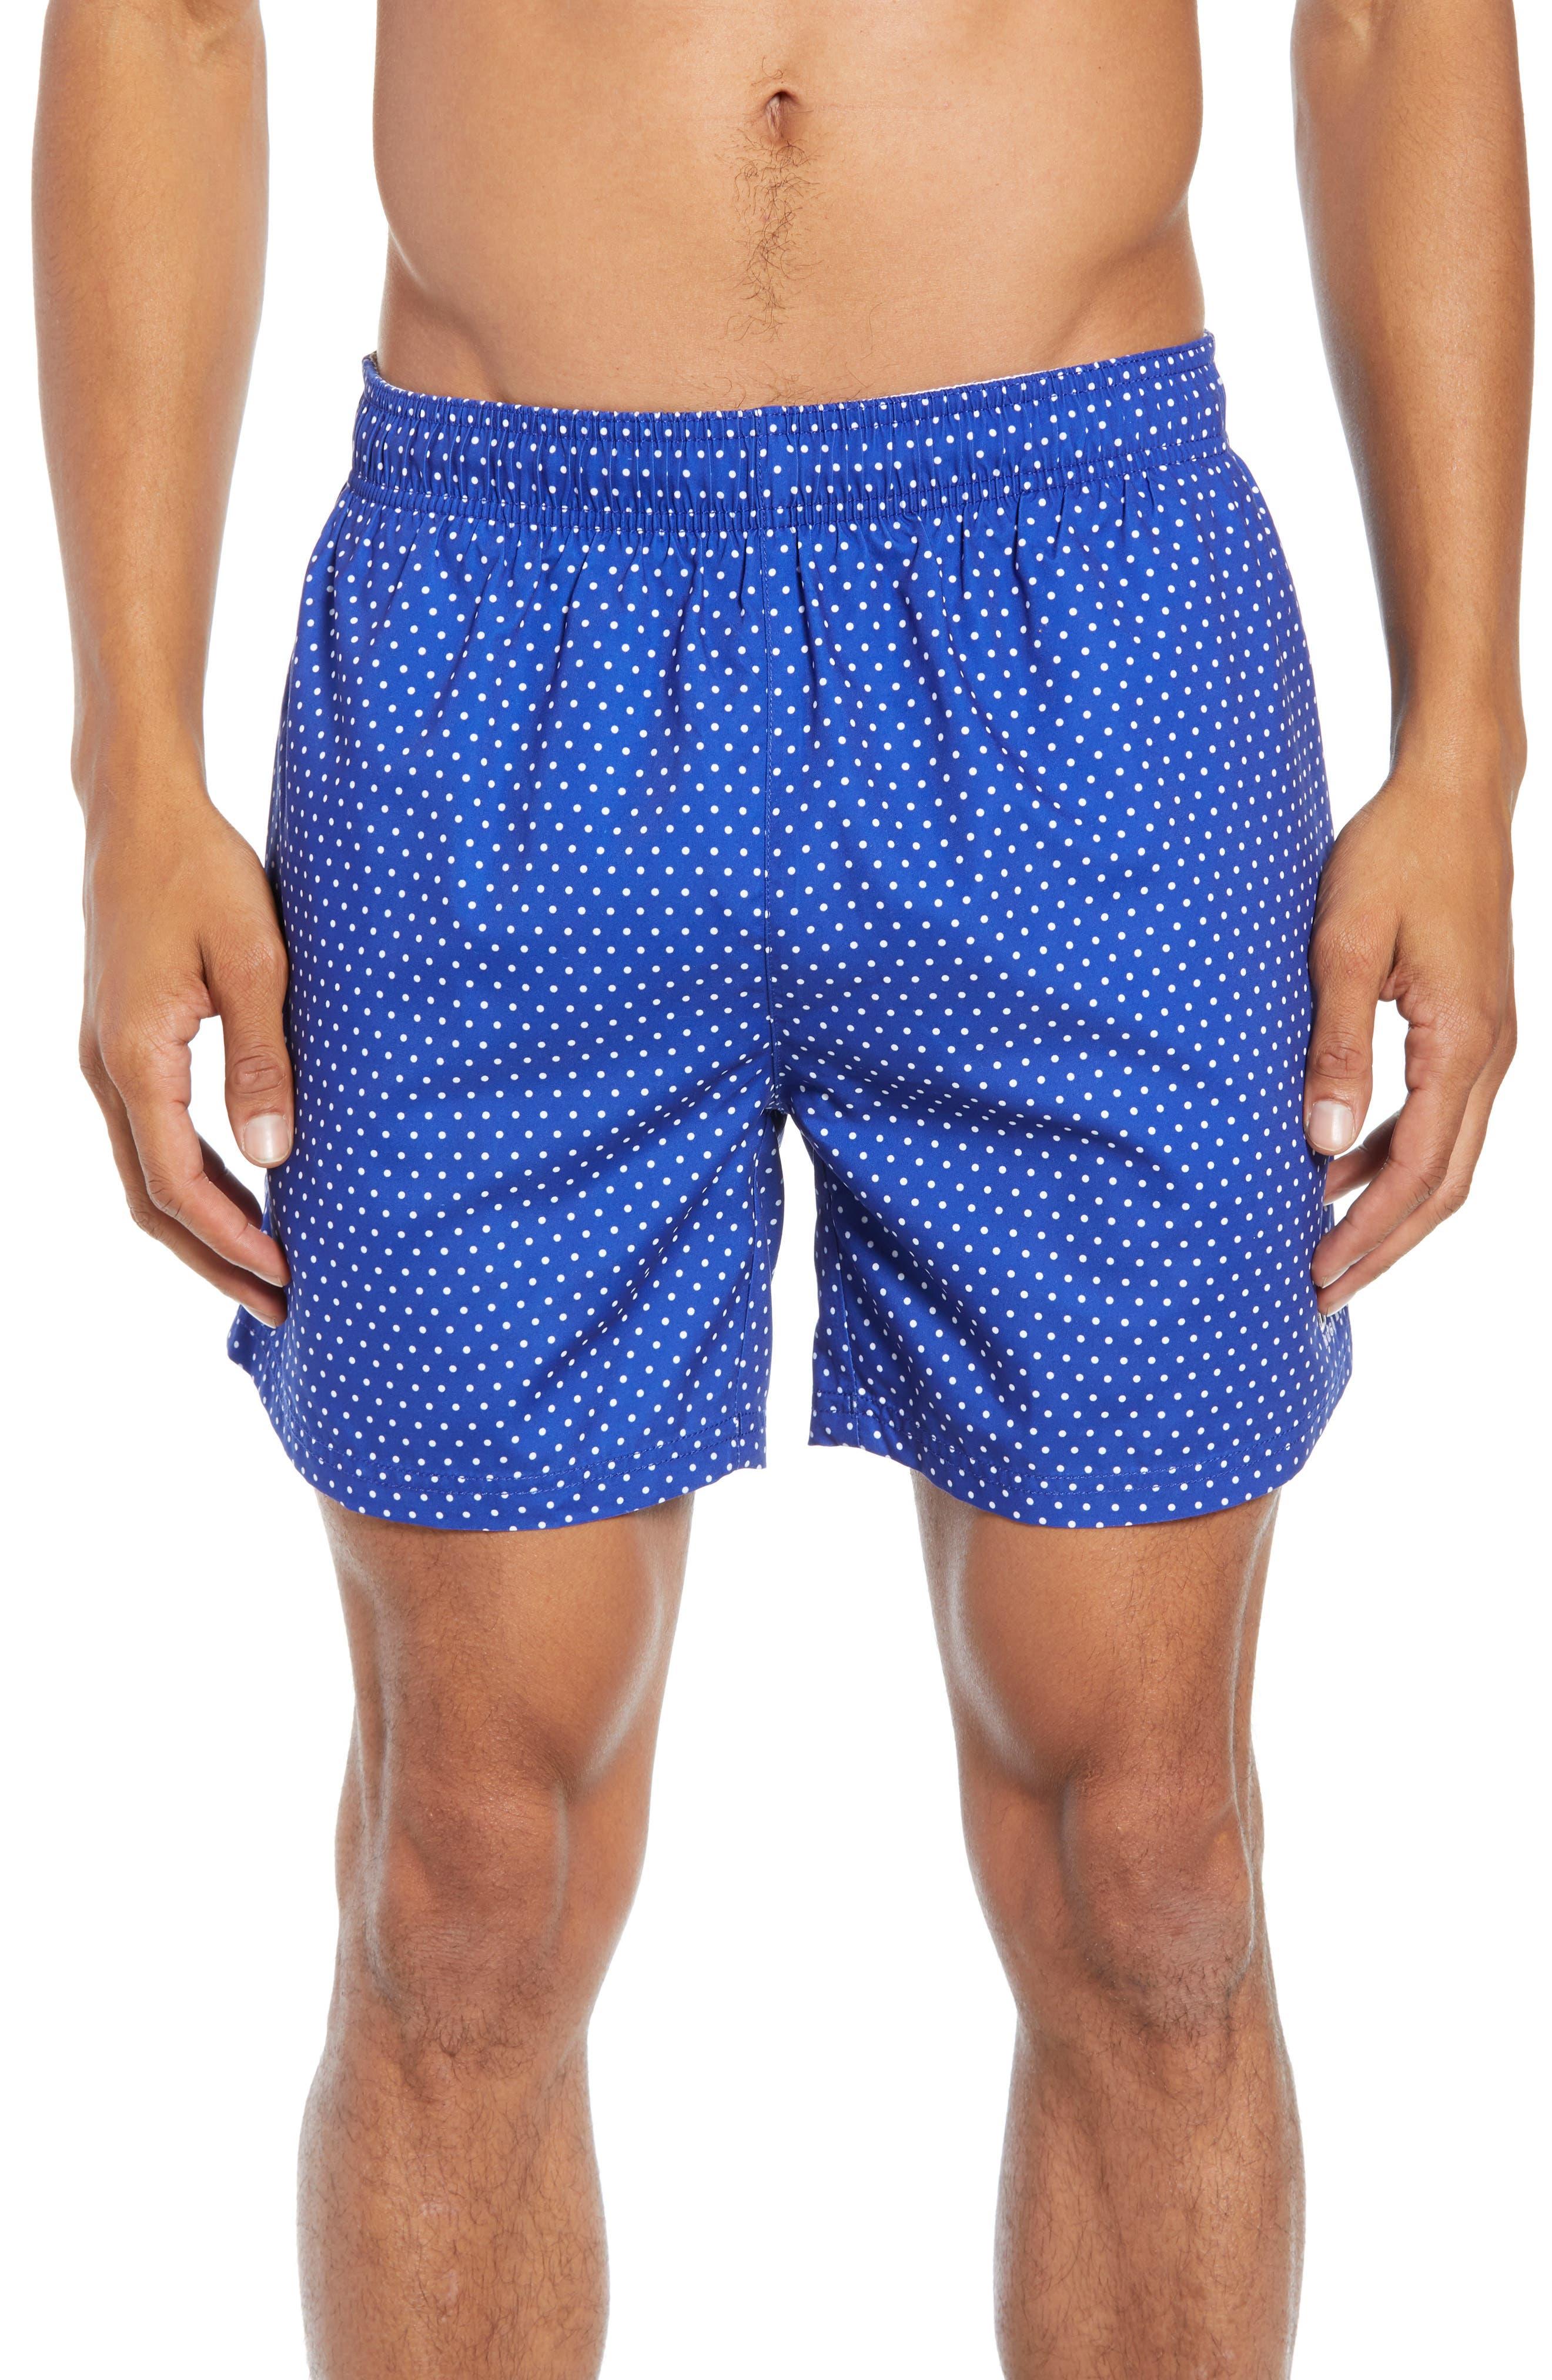 BOSS, Pike Regular Fit Polka Dot Swim Shorts, Main thumbnail 1, color, BLUE